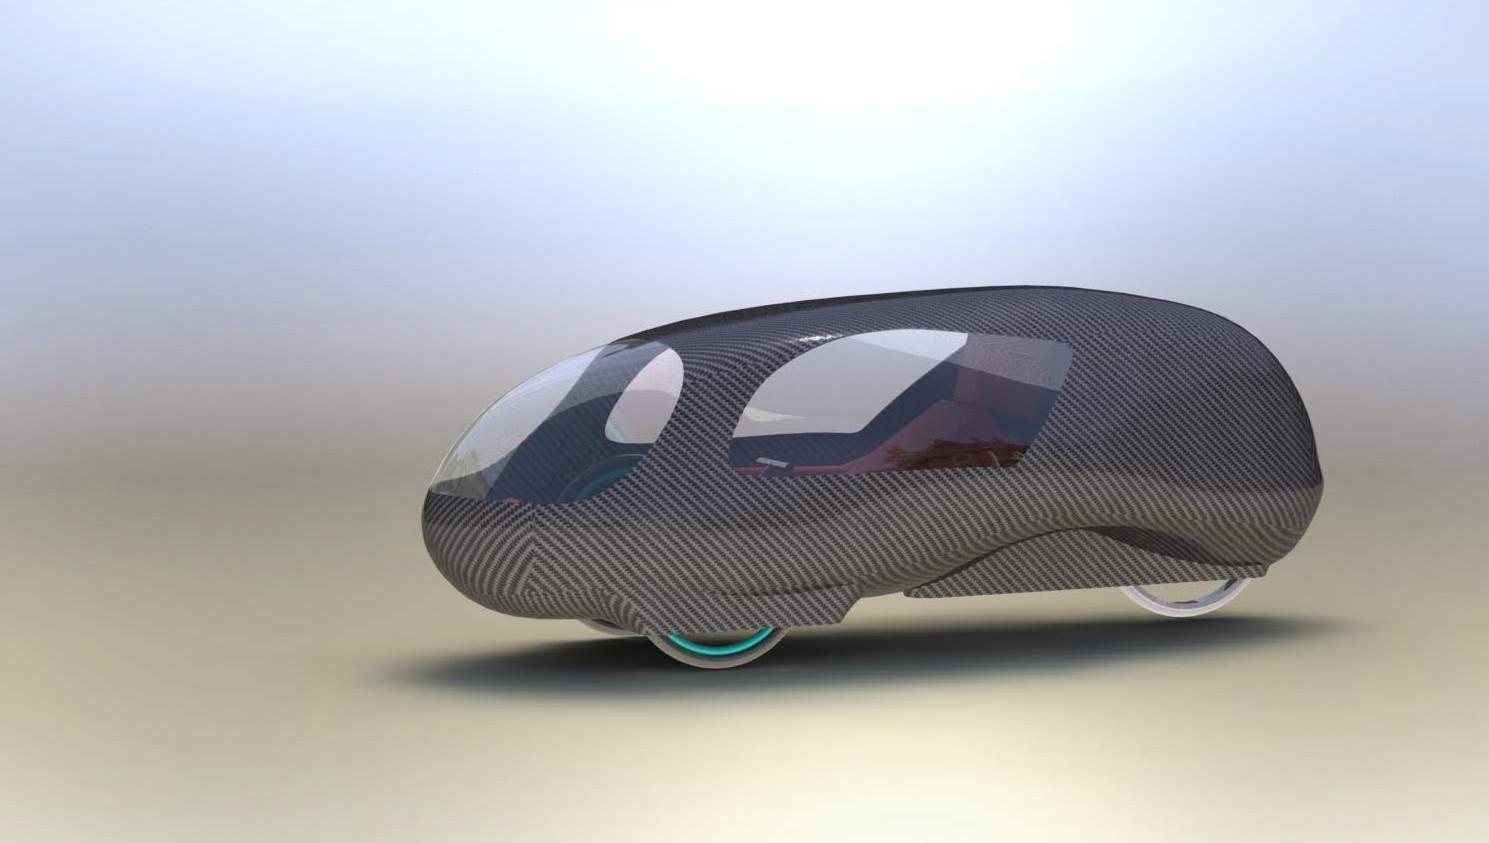 Vehicle graphic rendering